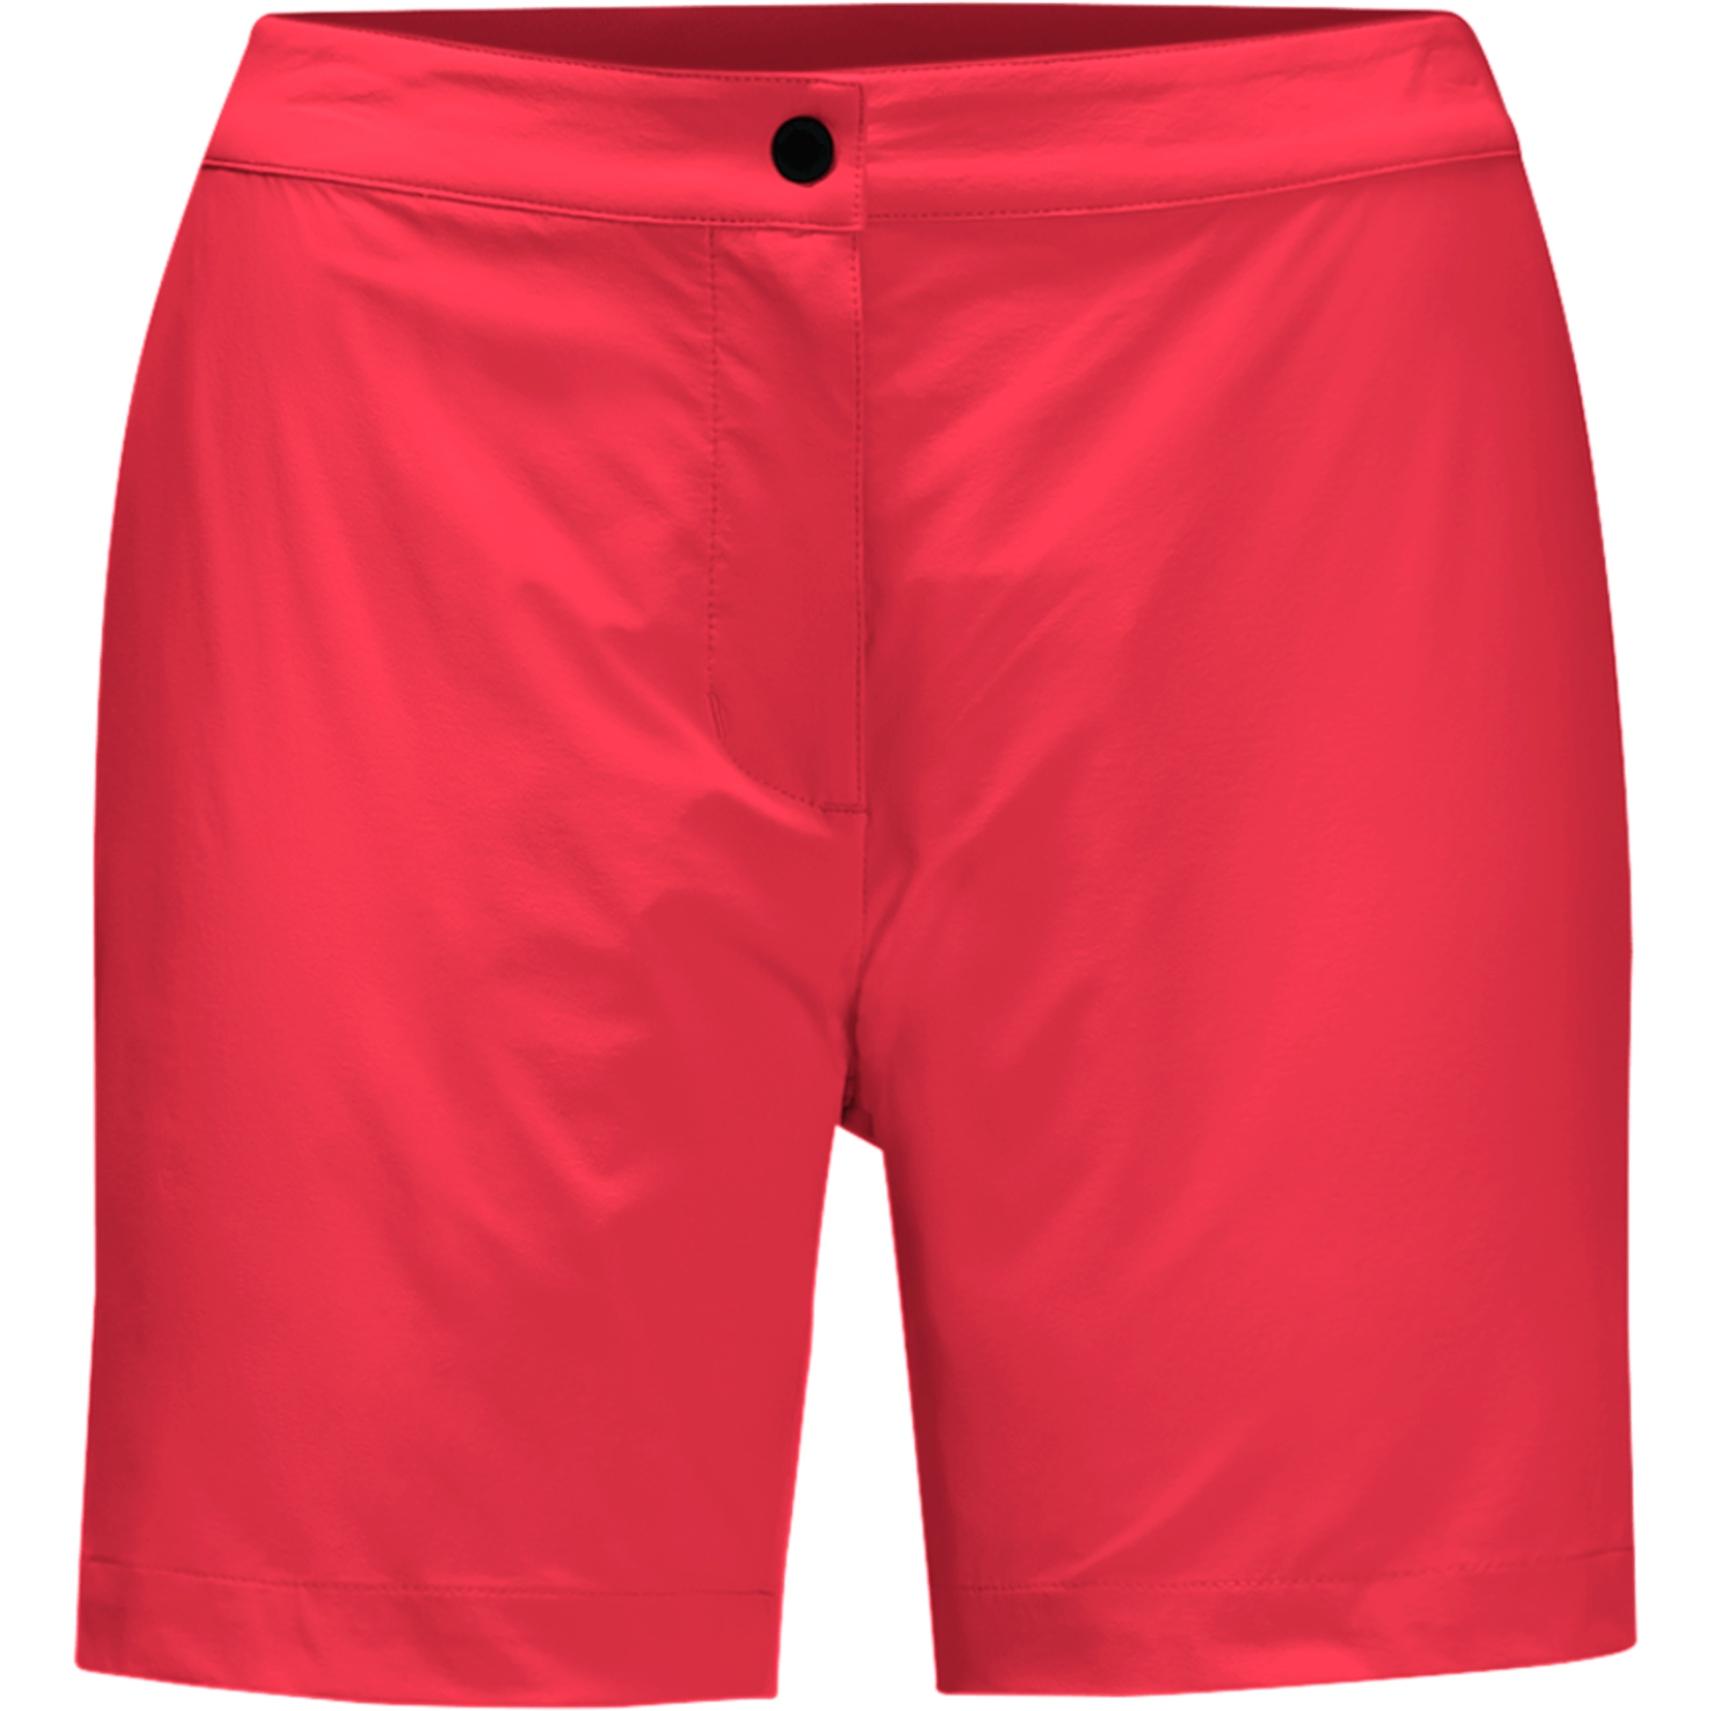 Jack Wolfskin JWP Shorts W Damenhose - tulip red